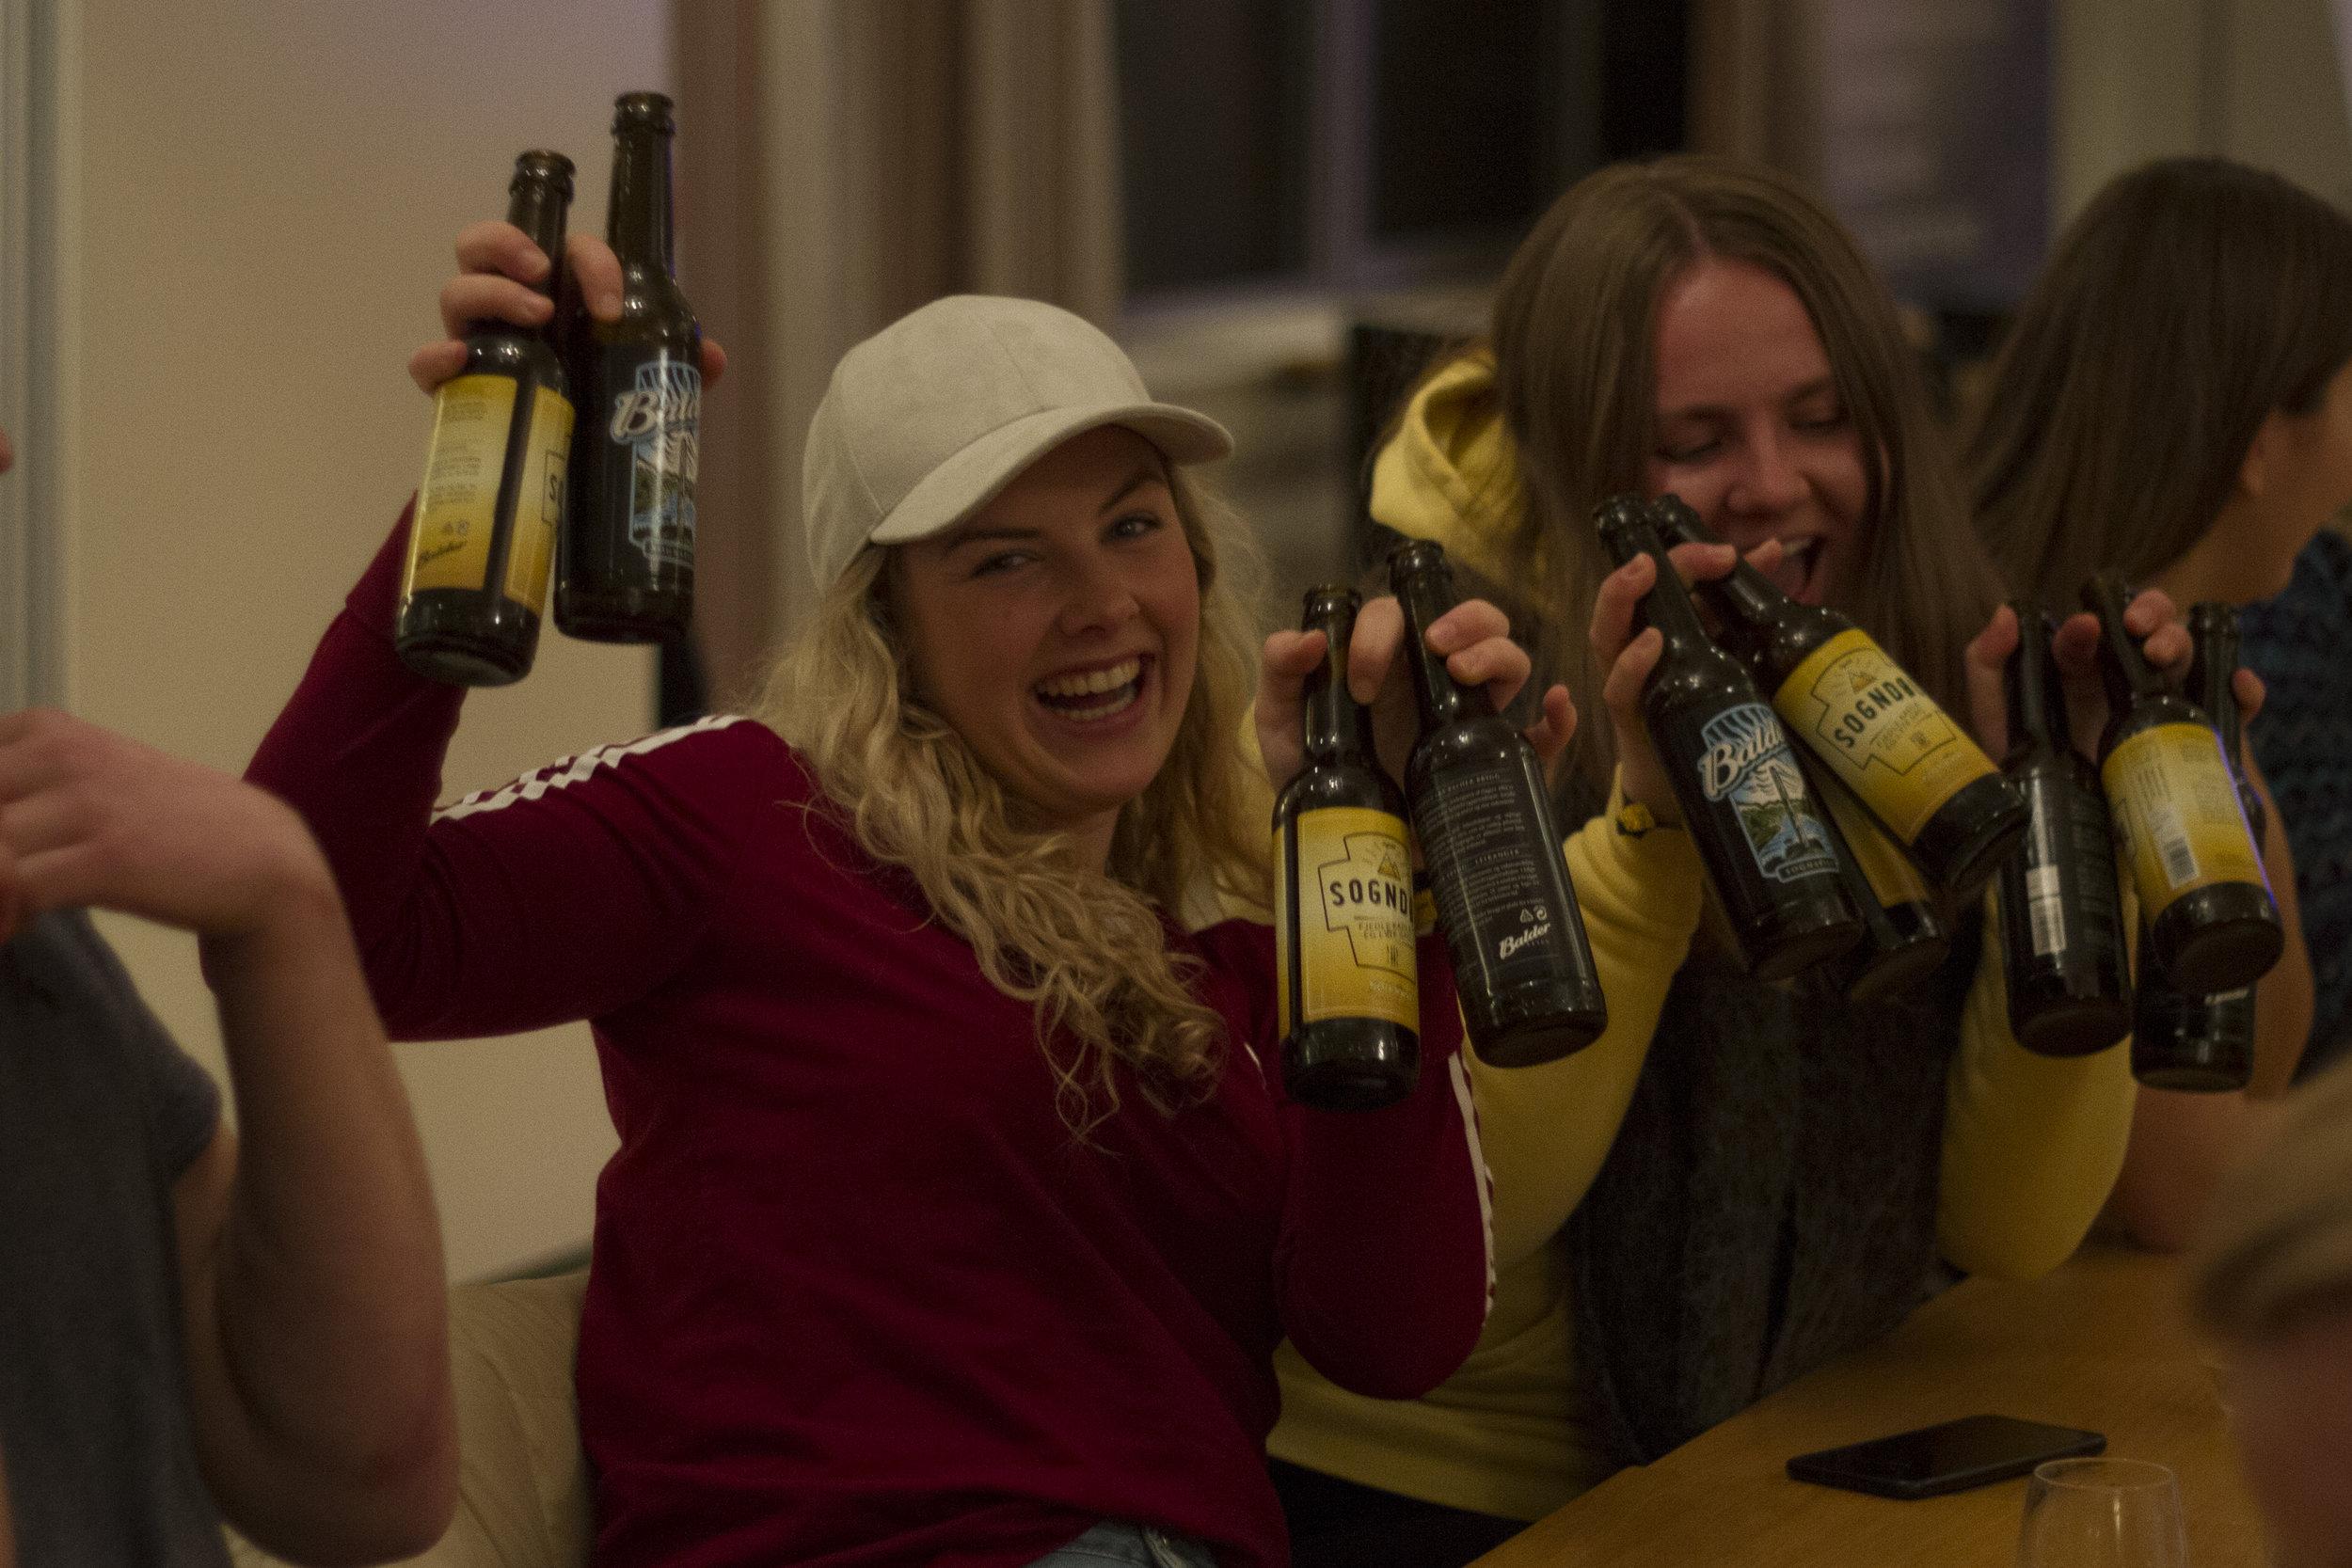 ØlsmakingMedBalder_2018_IdaFalkgjerdetSvåi_12.jpg